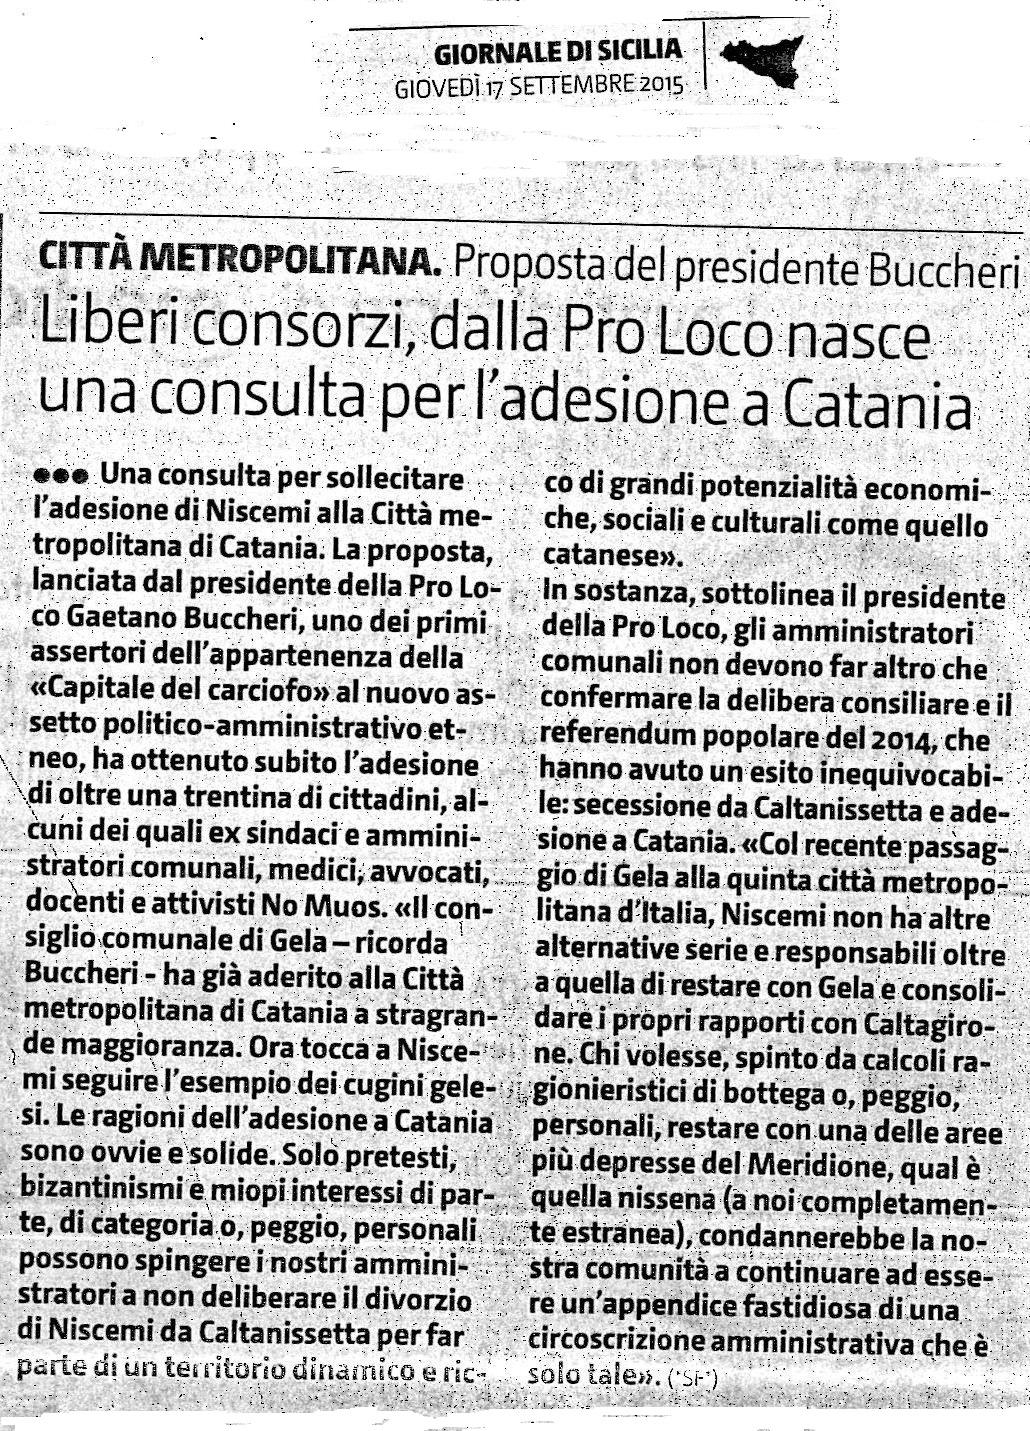 Pro_Loco_Città_Metropolitana_GdS_17_9_2015002